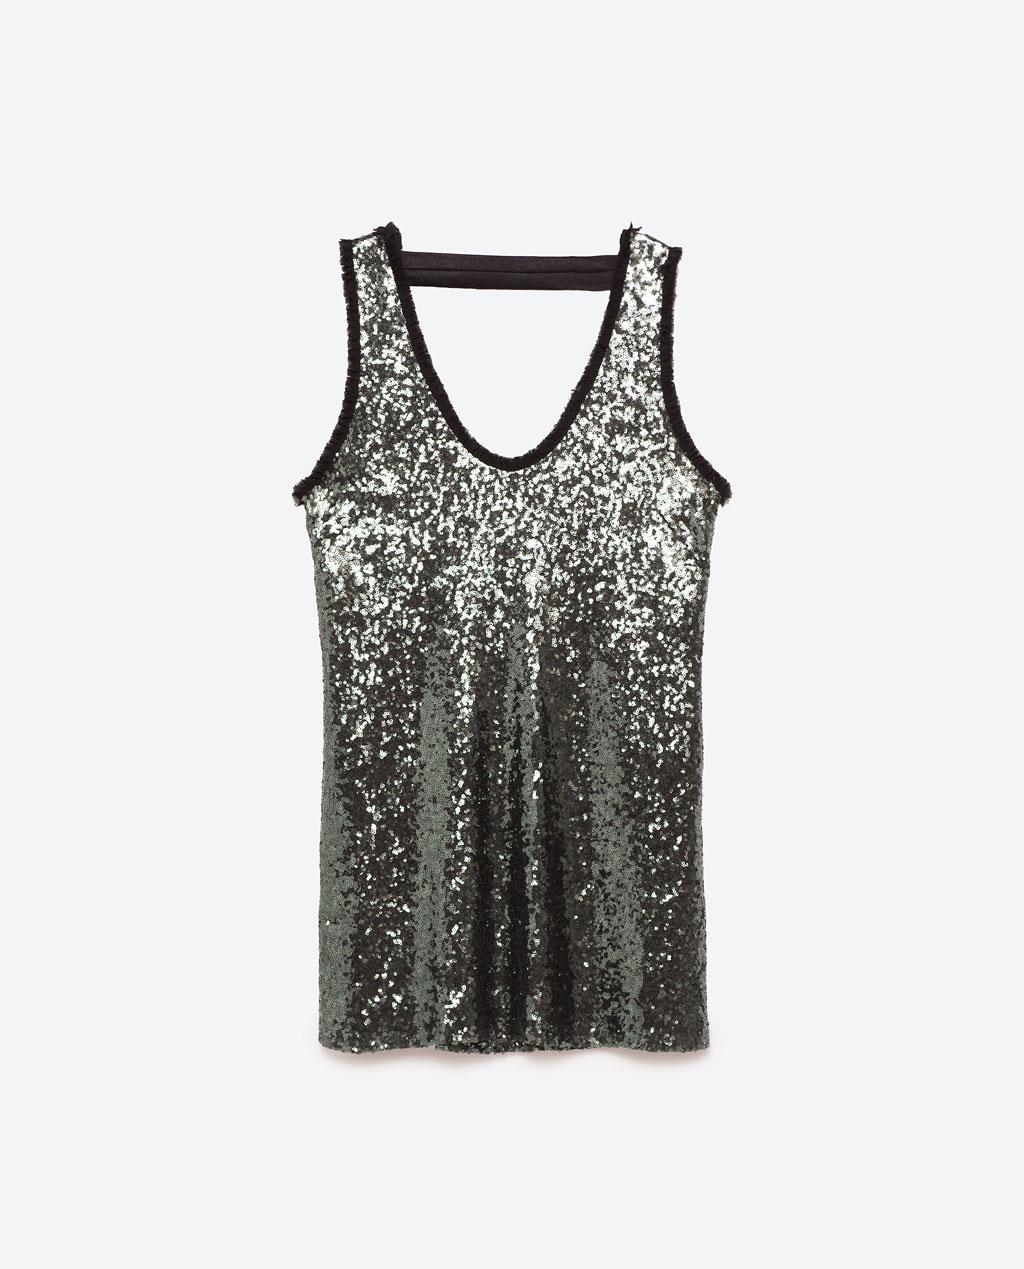 http://www.zara.com/us/en/sale/woman/dresses/sequin-mini-dress-c437631p3988515.html